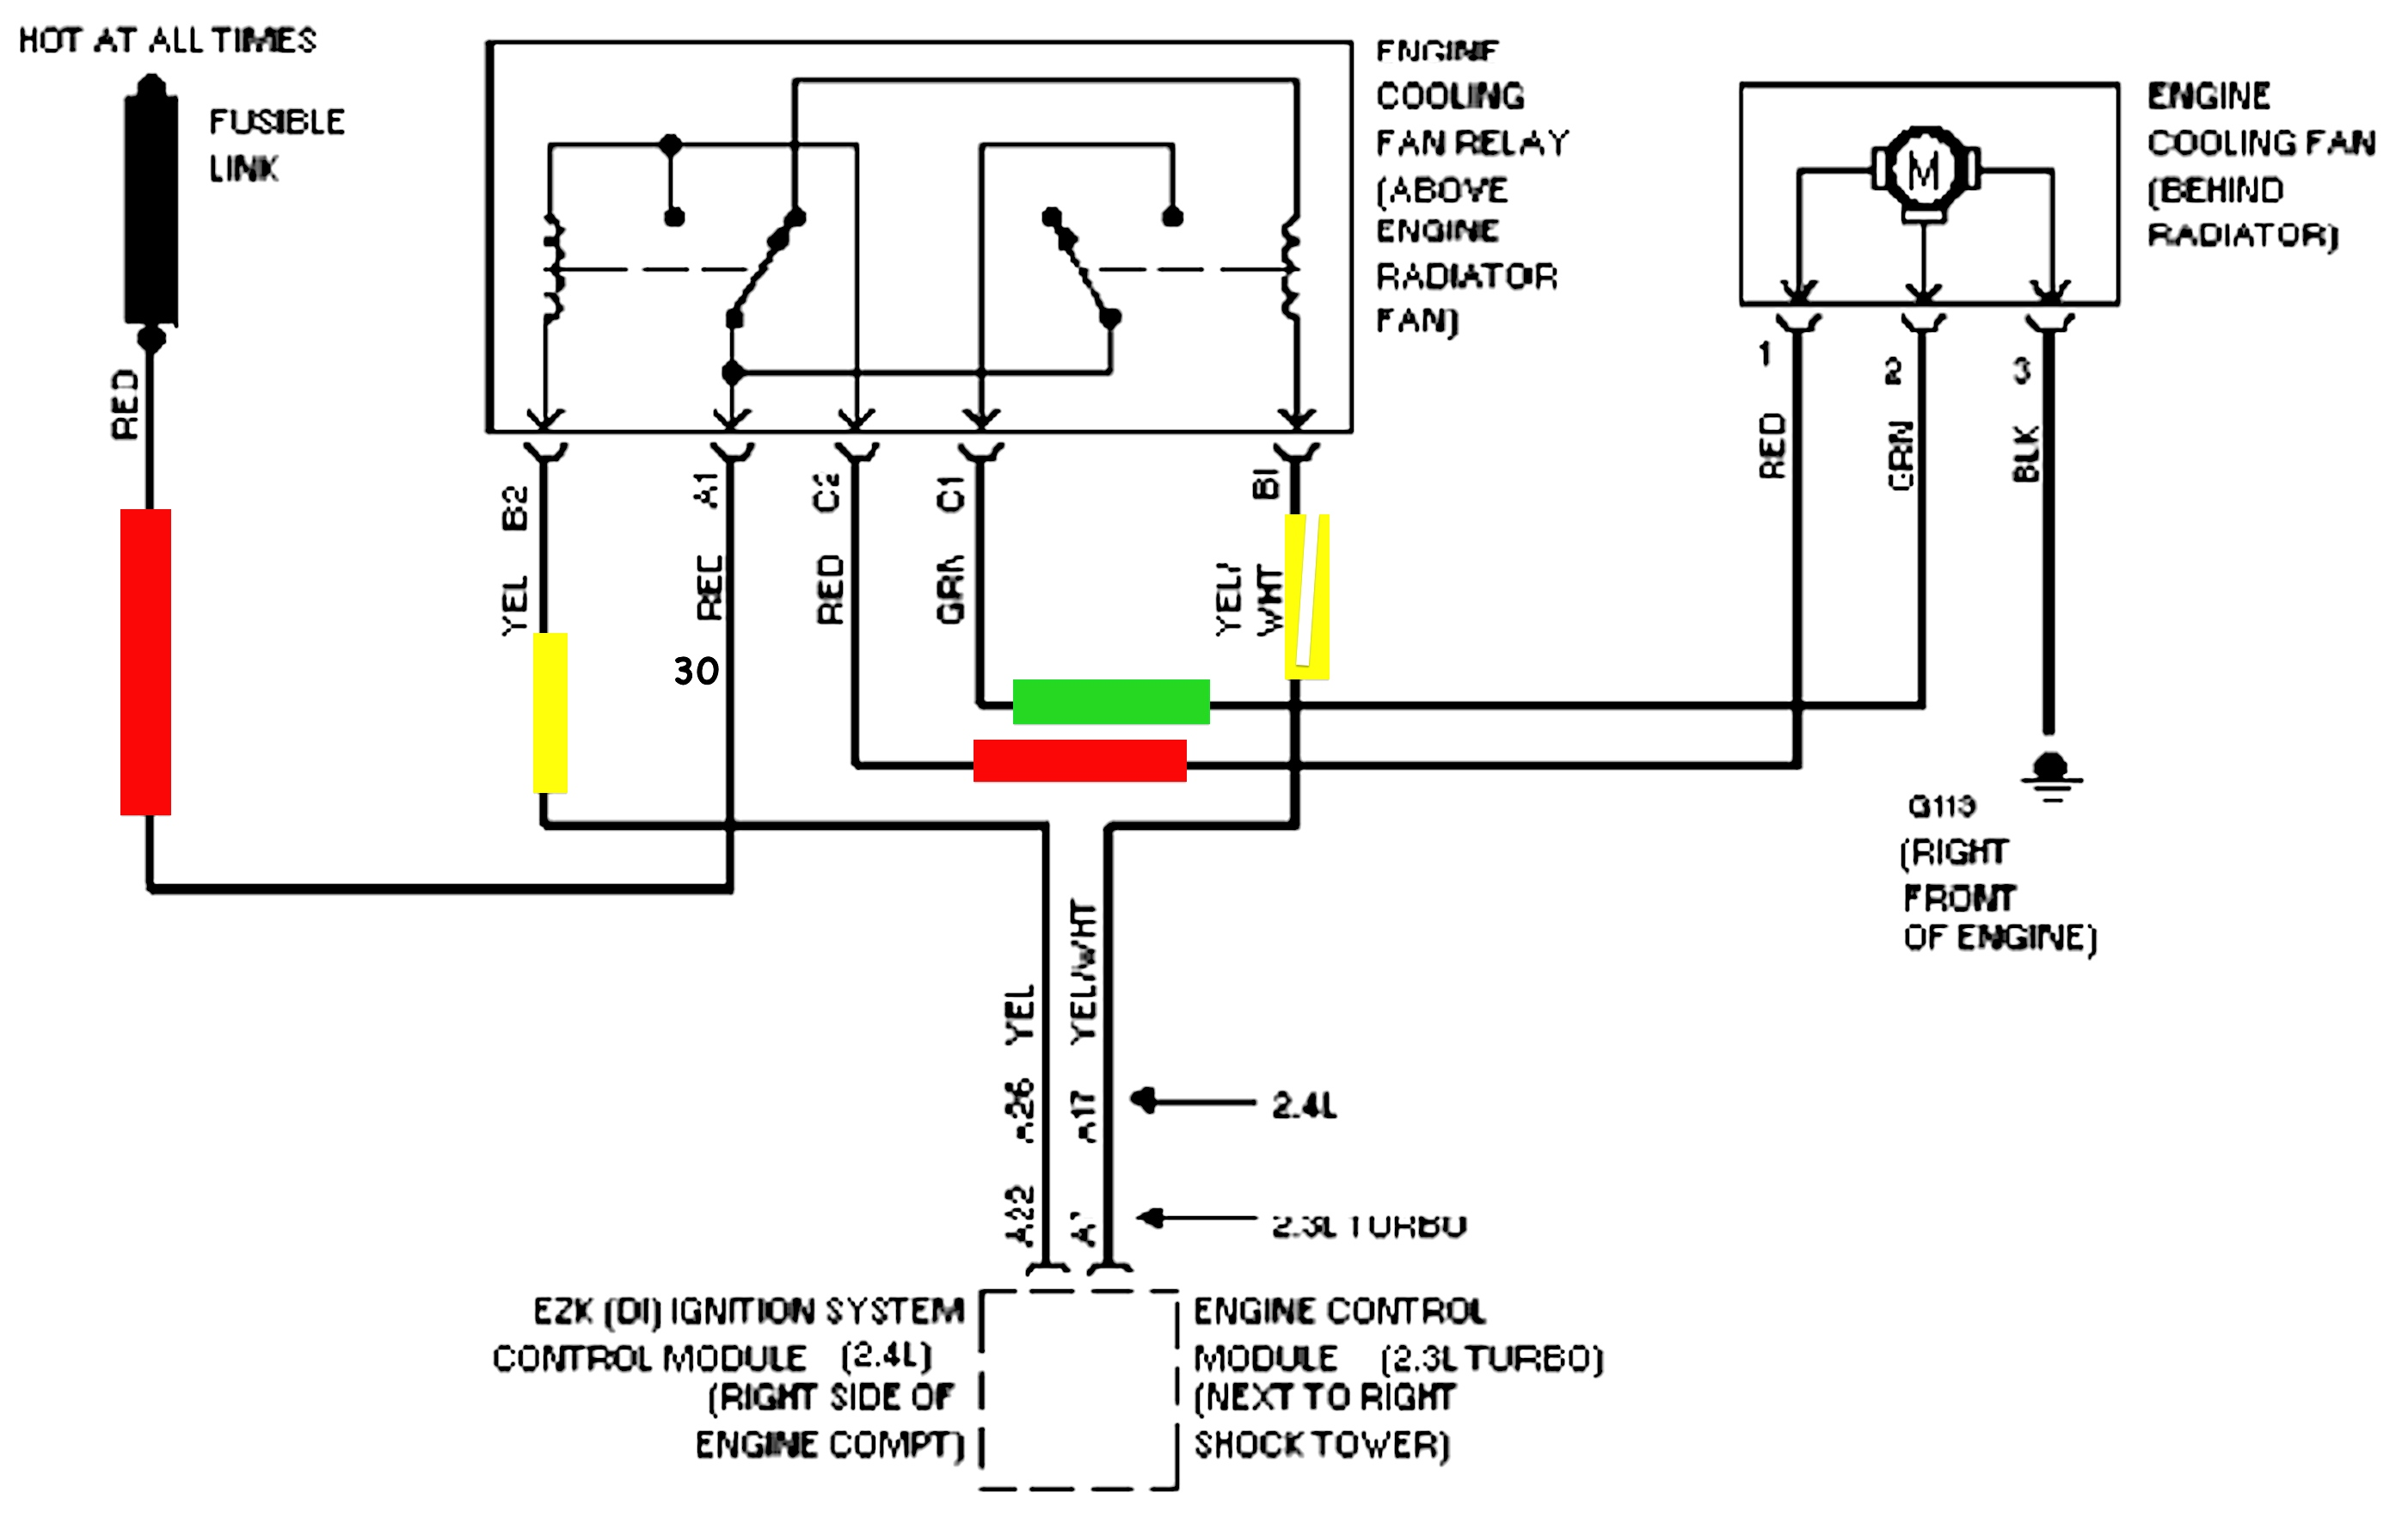 Volvo Fan Control Wiring - Var Wiring Diagram brain-superior -  brain-superior.europe-carpooling.it | Volvo Fan Control Wiring Diagram |  | brain-superior.europe-carpooling.it